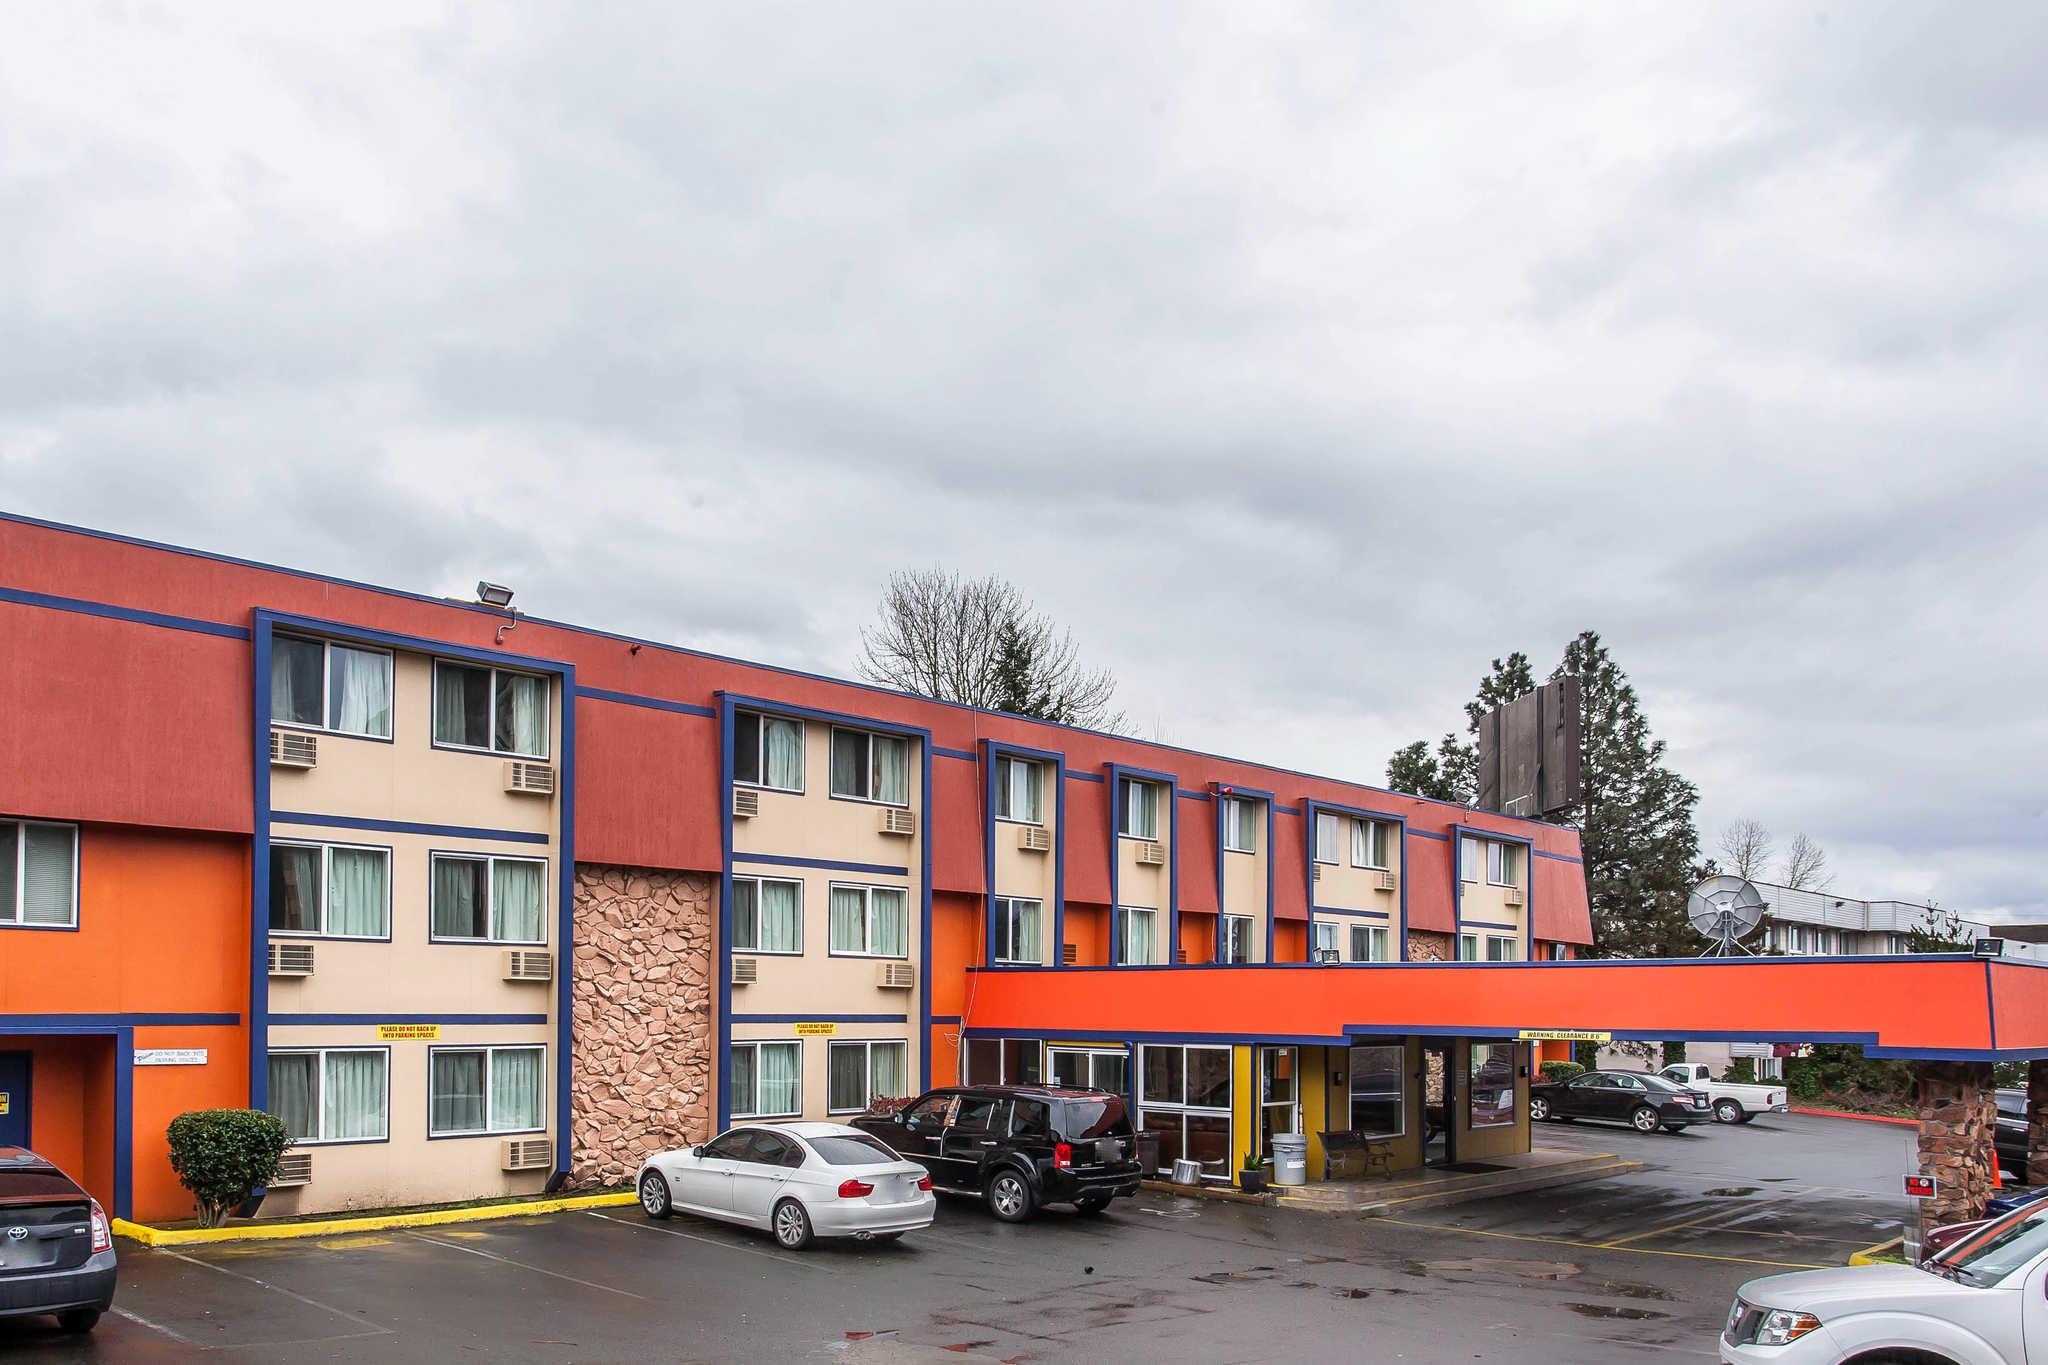 Rodeway Inn image 3